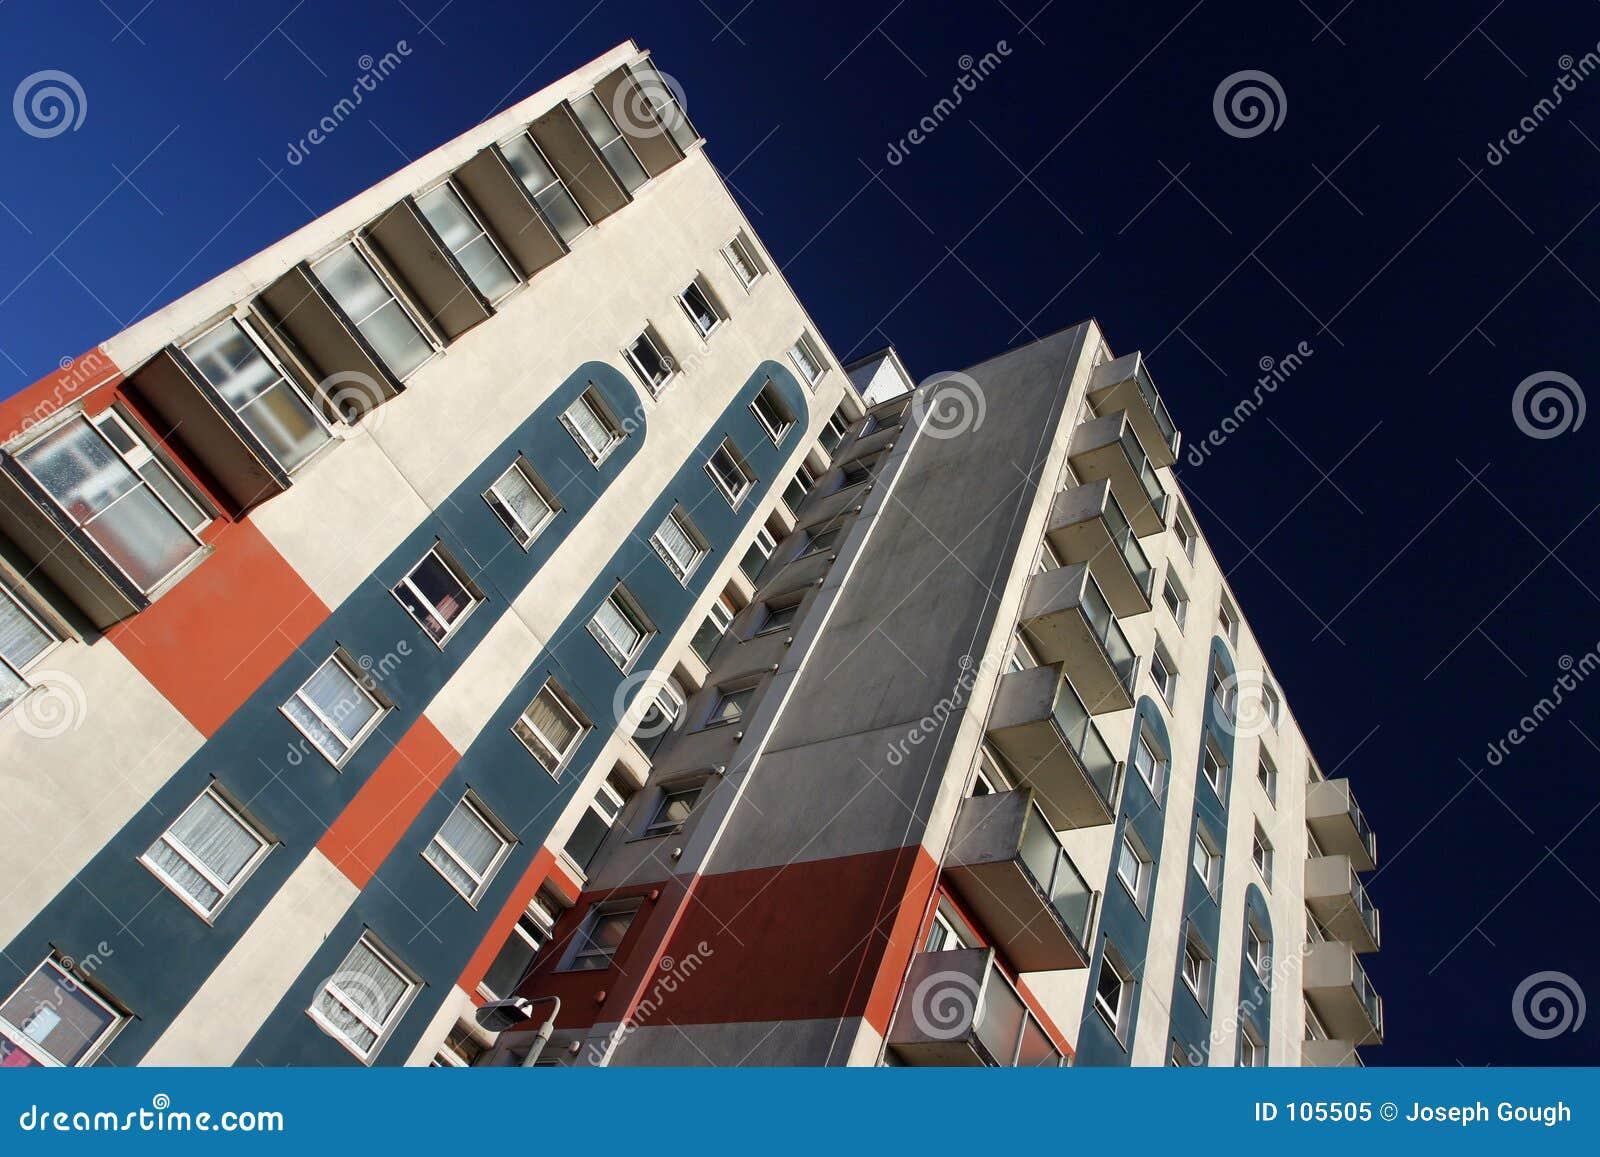 Density high housing